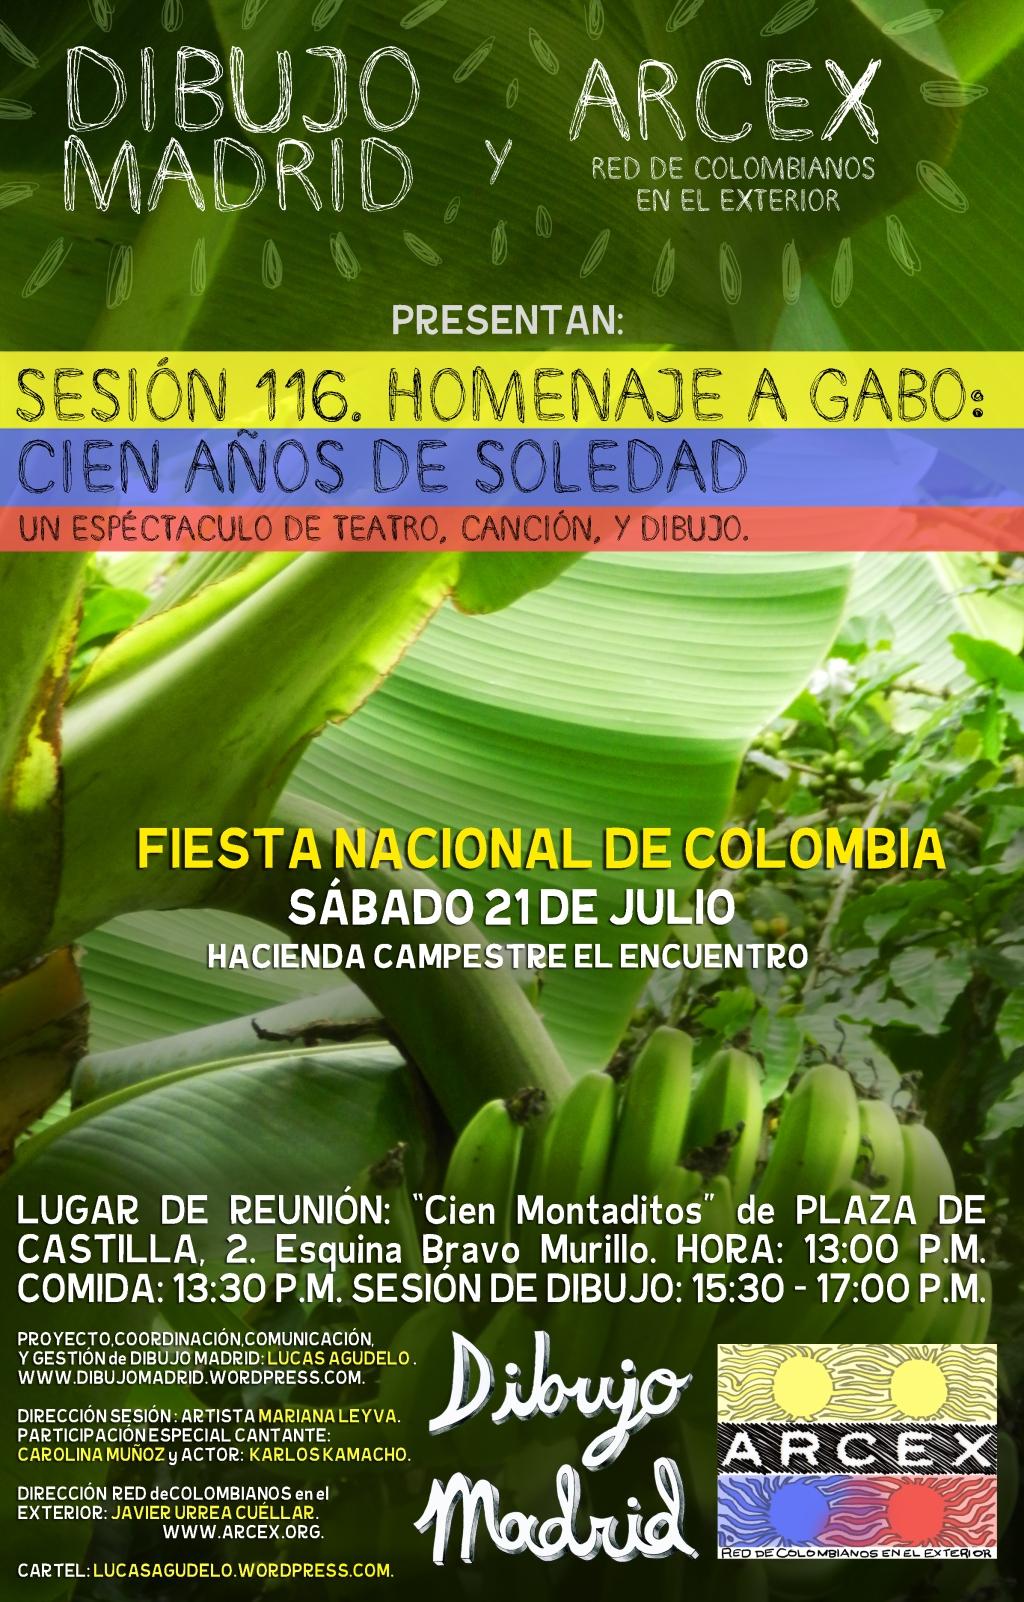 fiesta_nacional_lucas_agudelo_dibujo_madrid